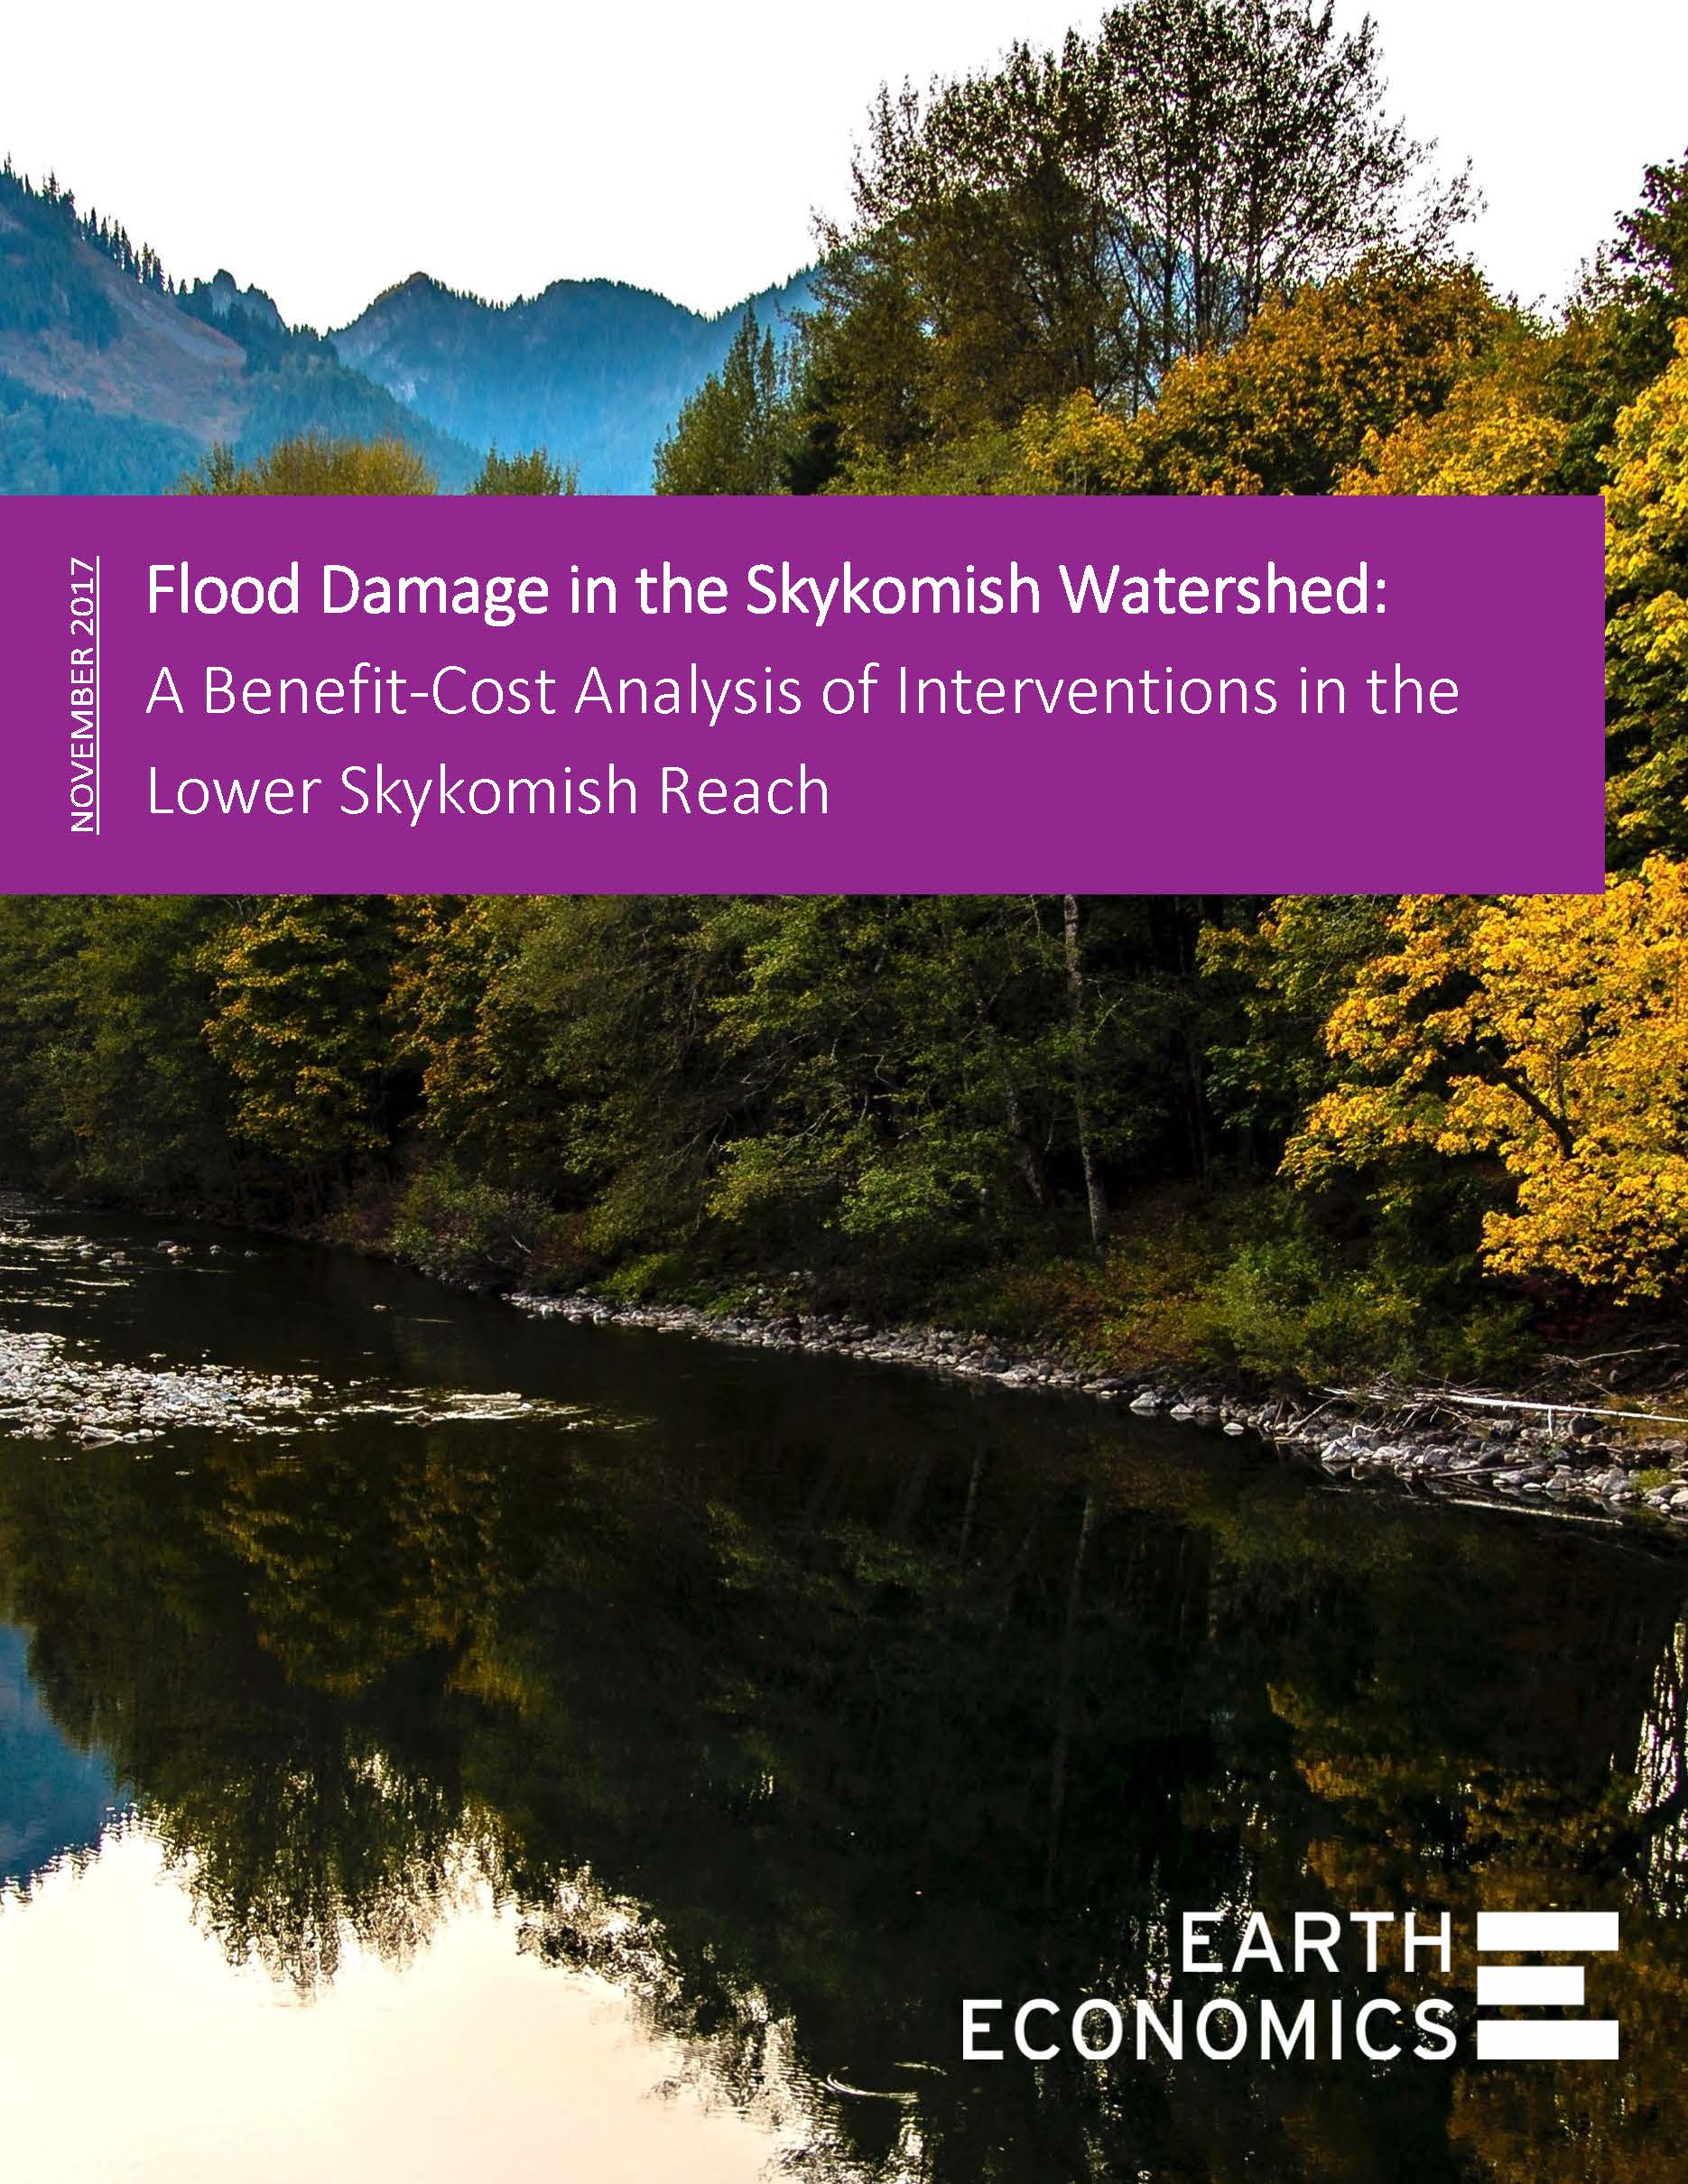 Cover_FloodDamageintheSkyhomishWatershed_EarthEconomics_Nov2017.jpg